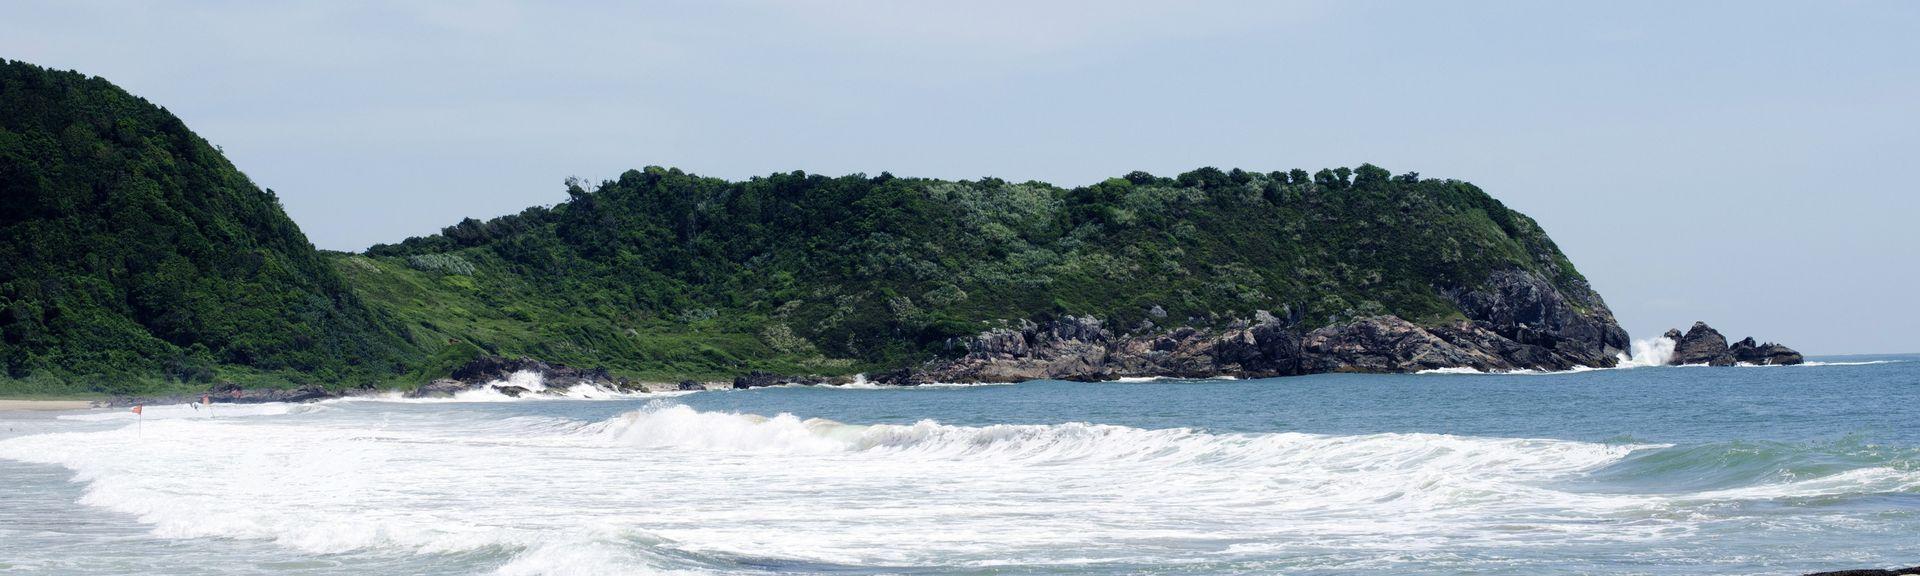 Barra Velha, Σάντα Καταρίνα, Βραζιλία